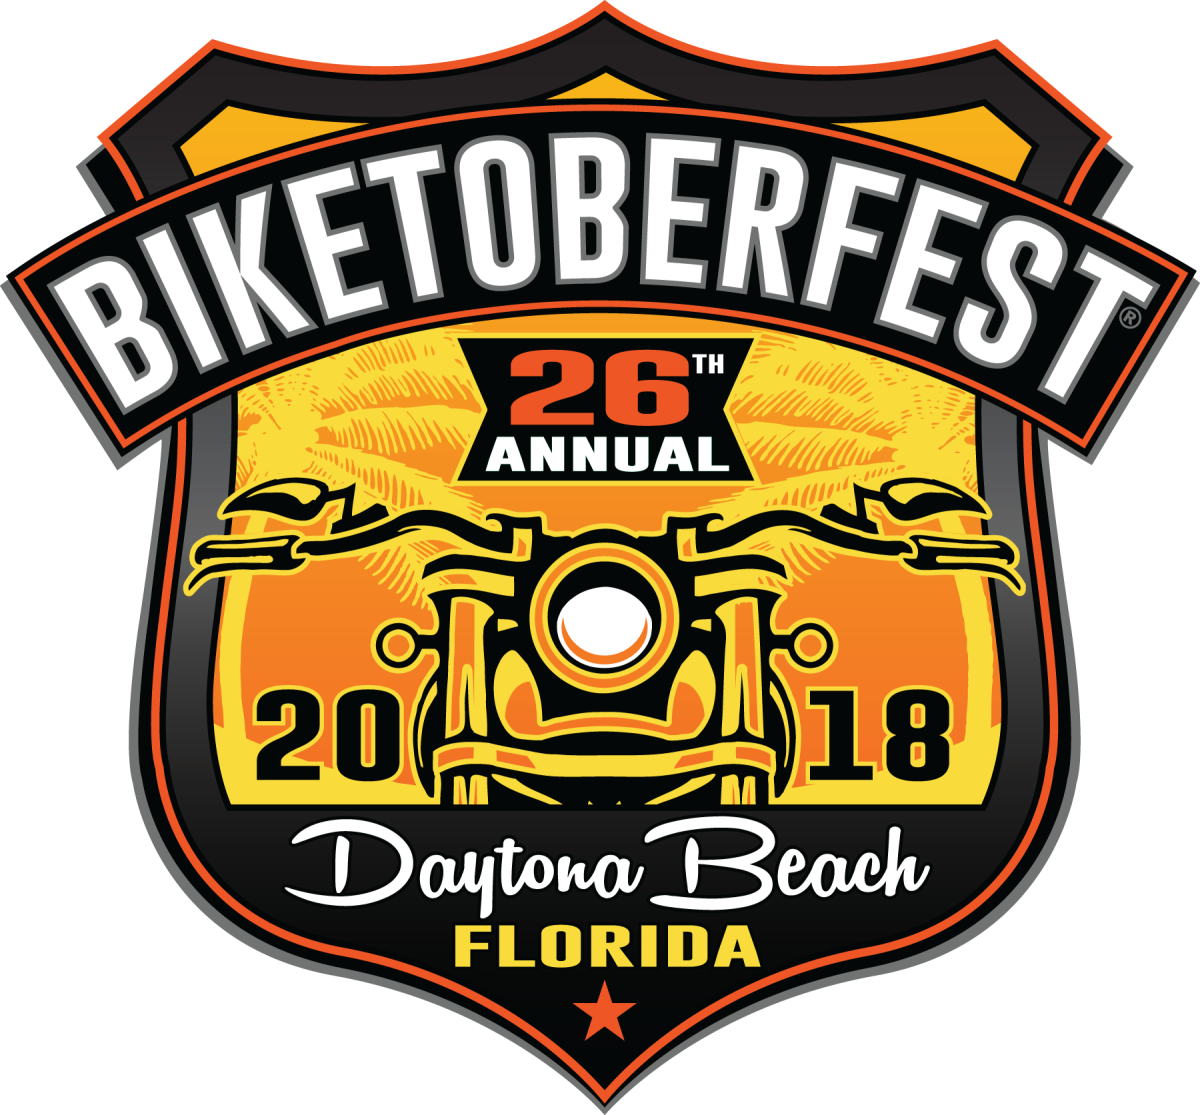 Biketoberfest 174 Daytona Beach Fl